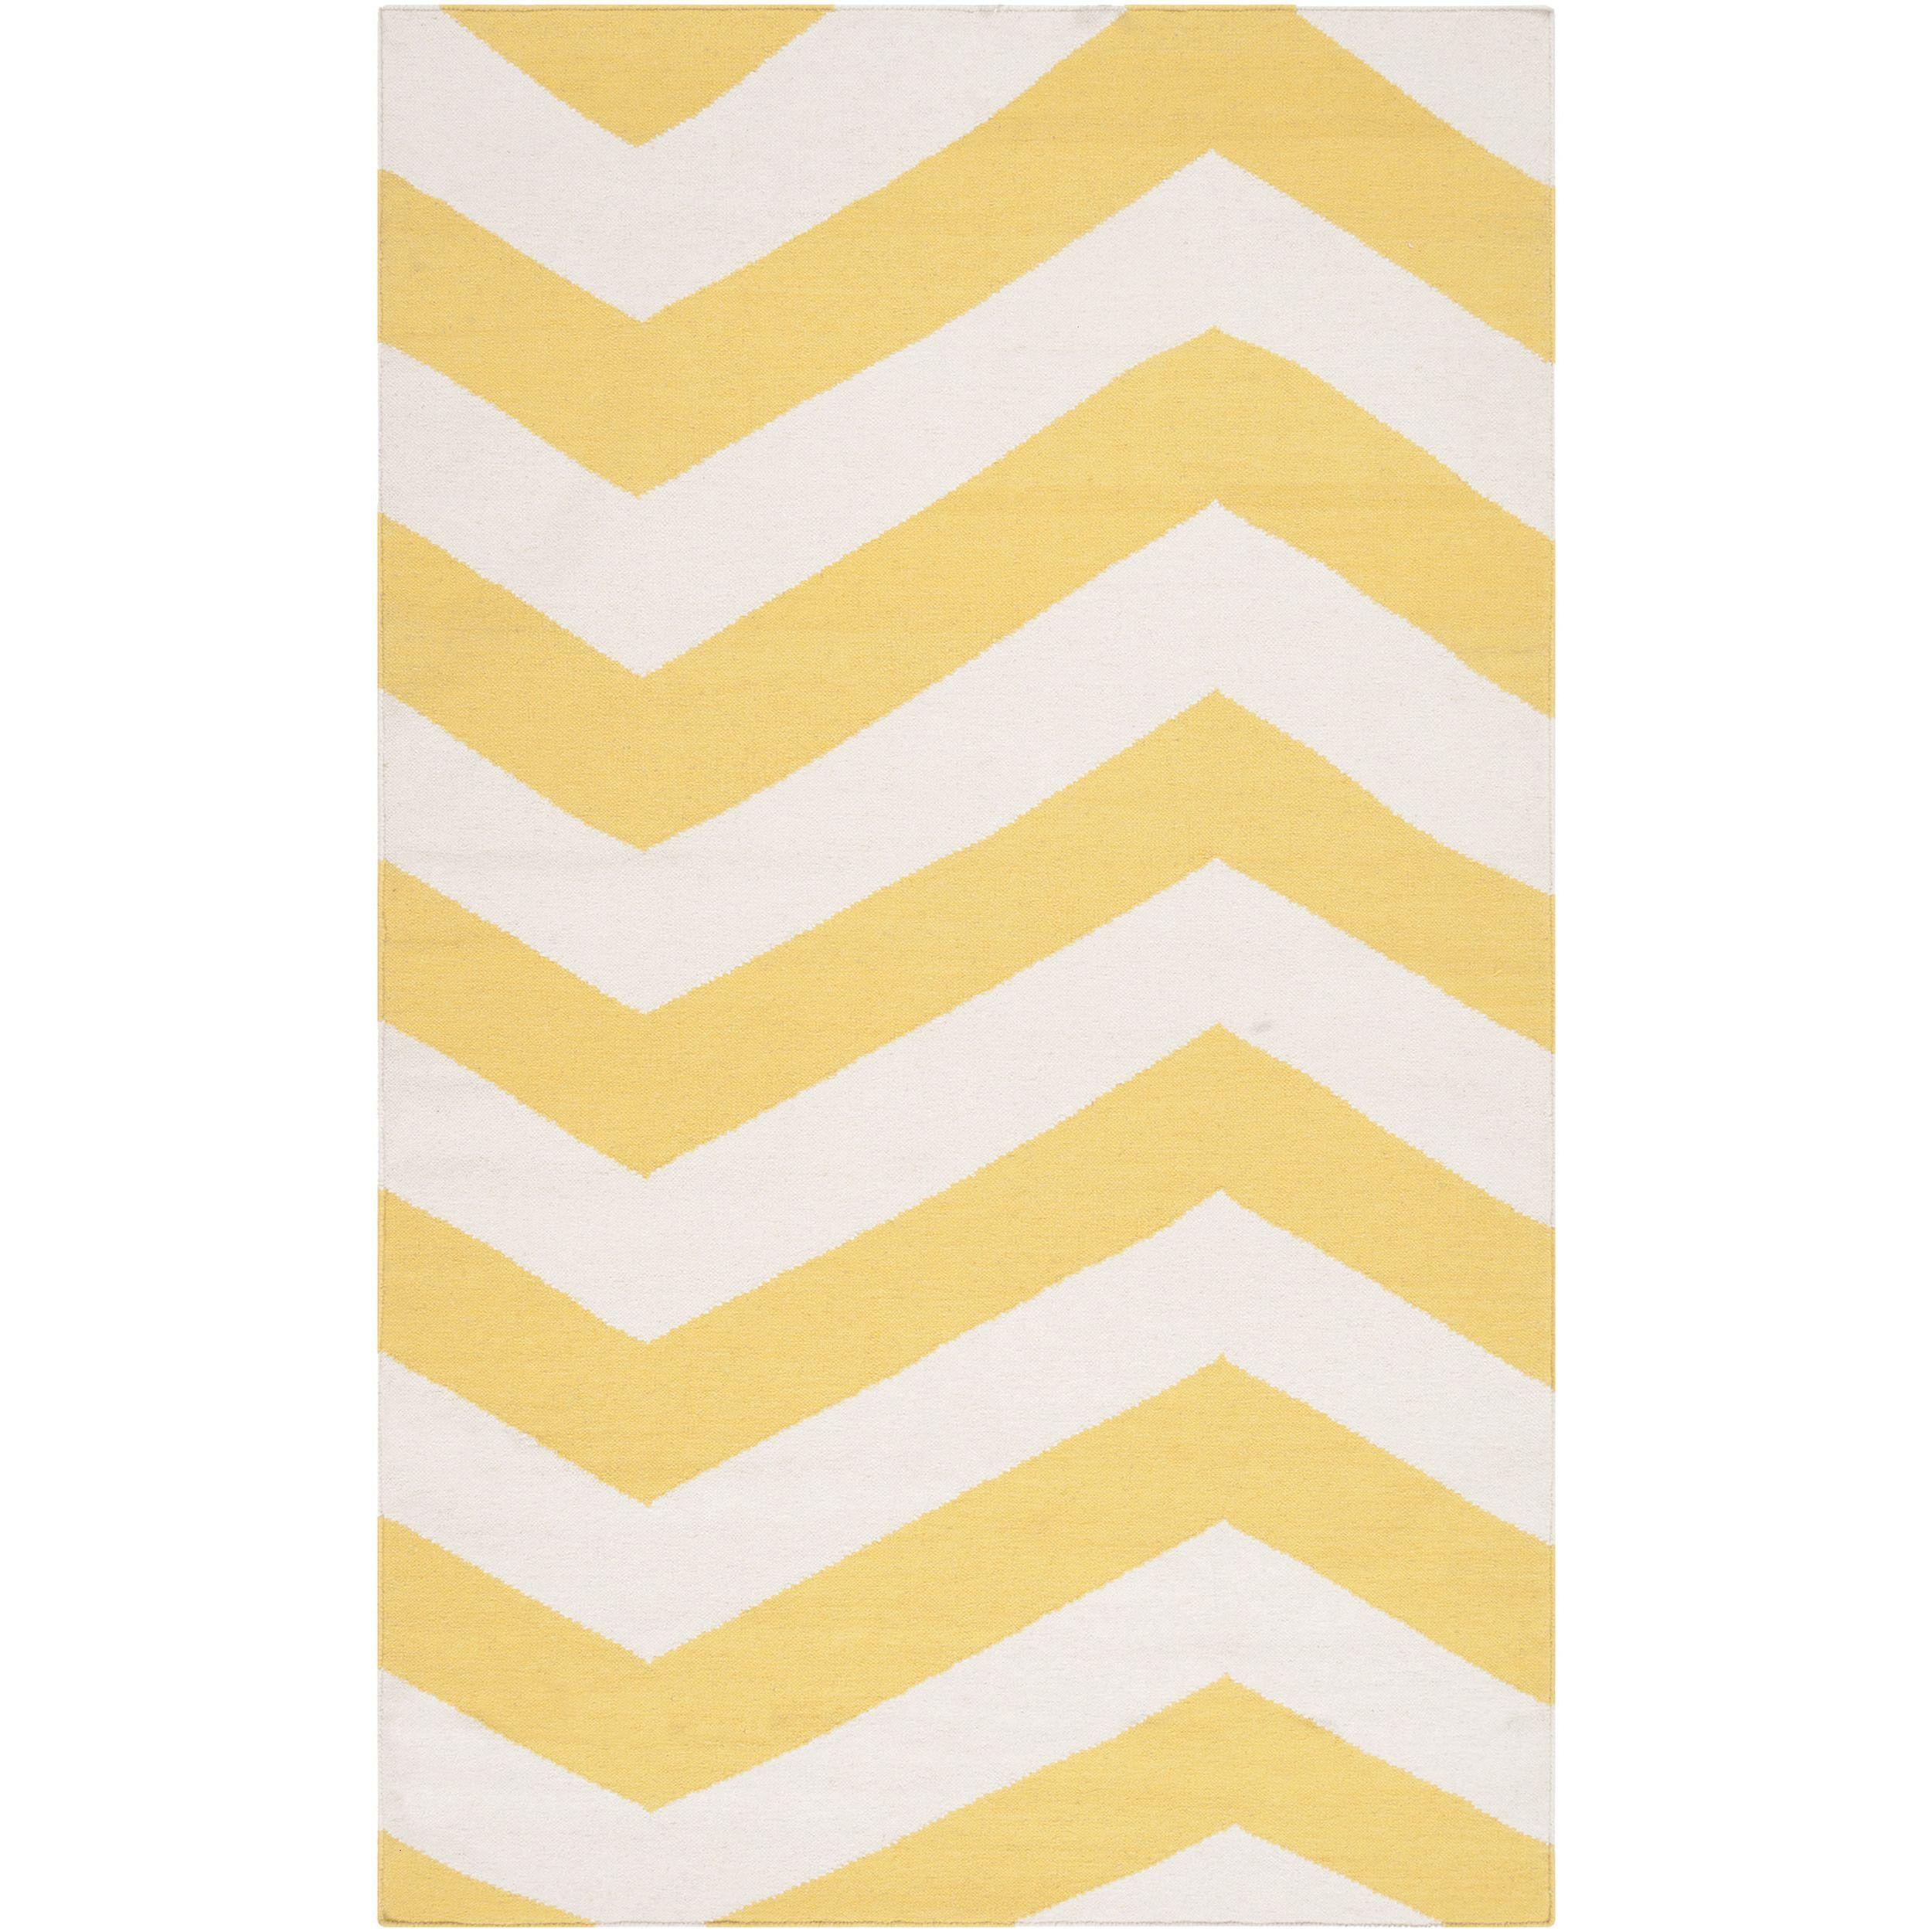 arvada flatweave chevron accent rug (' x ') (blue  (' x   - arvada flatweave chevron accent rug (' x